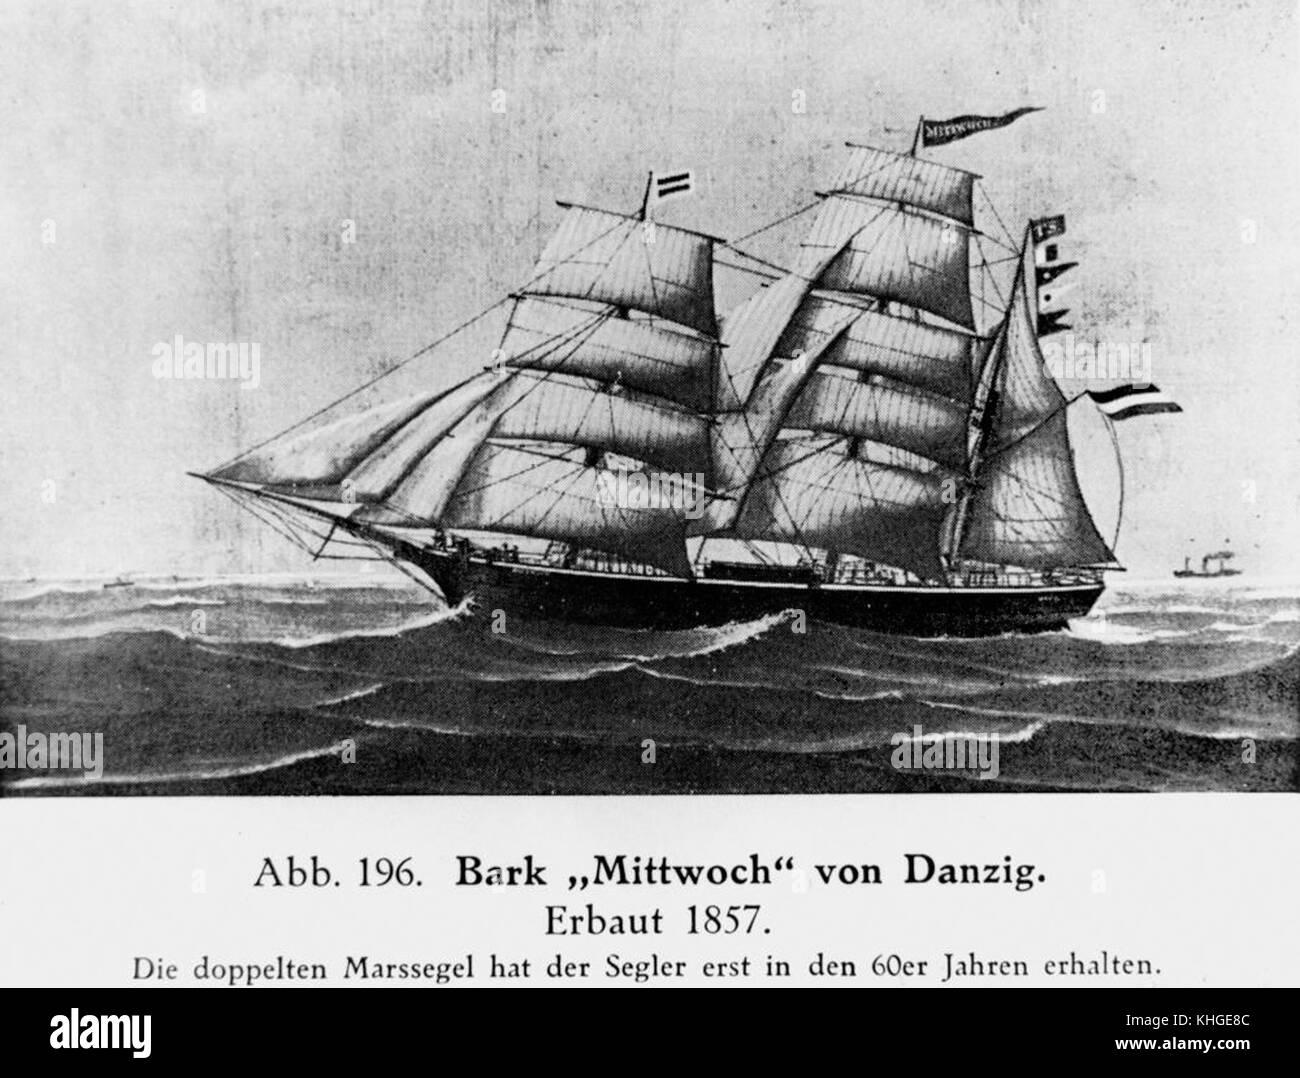 1 164003 Mittwoch (ship) Stock Photo